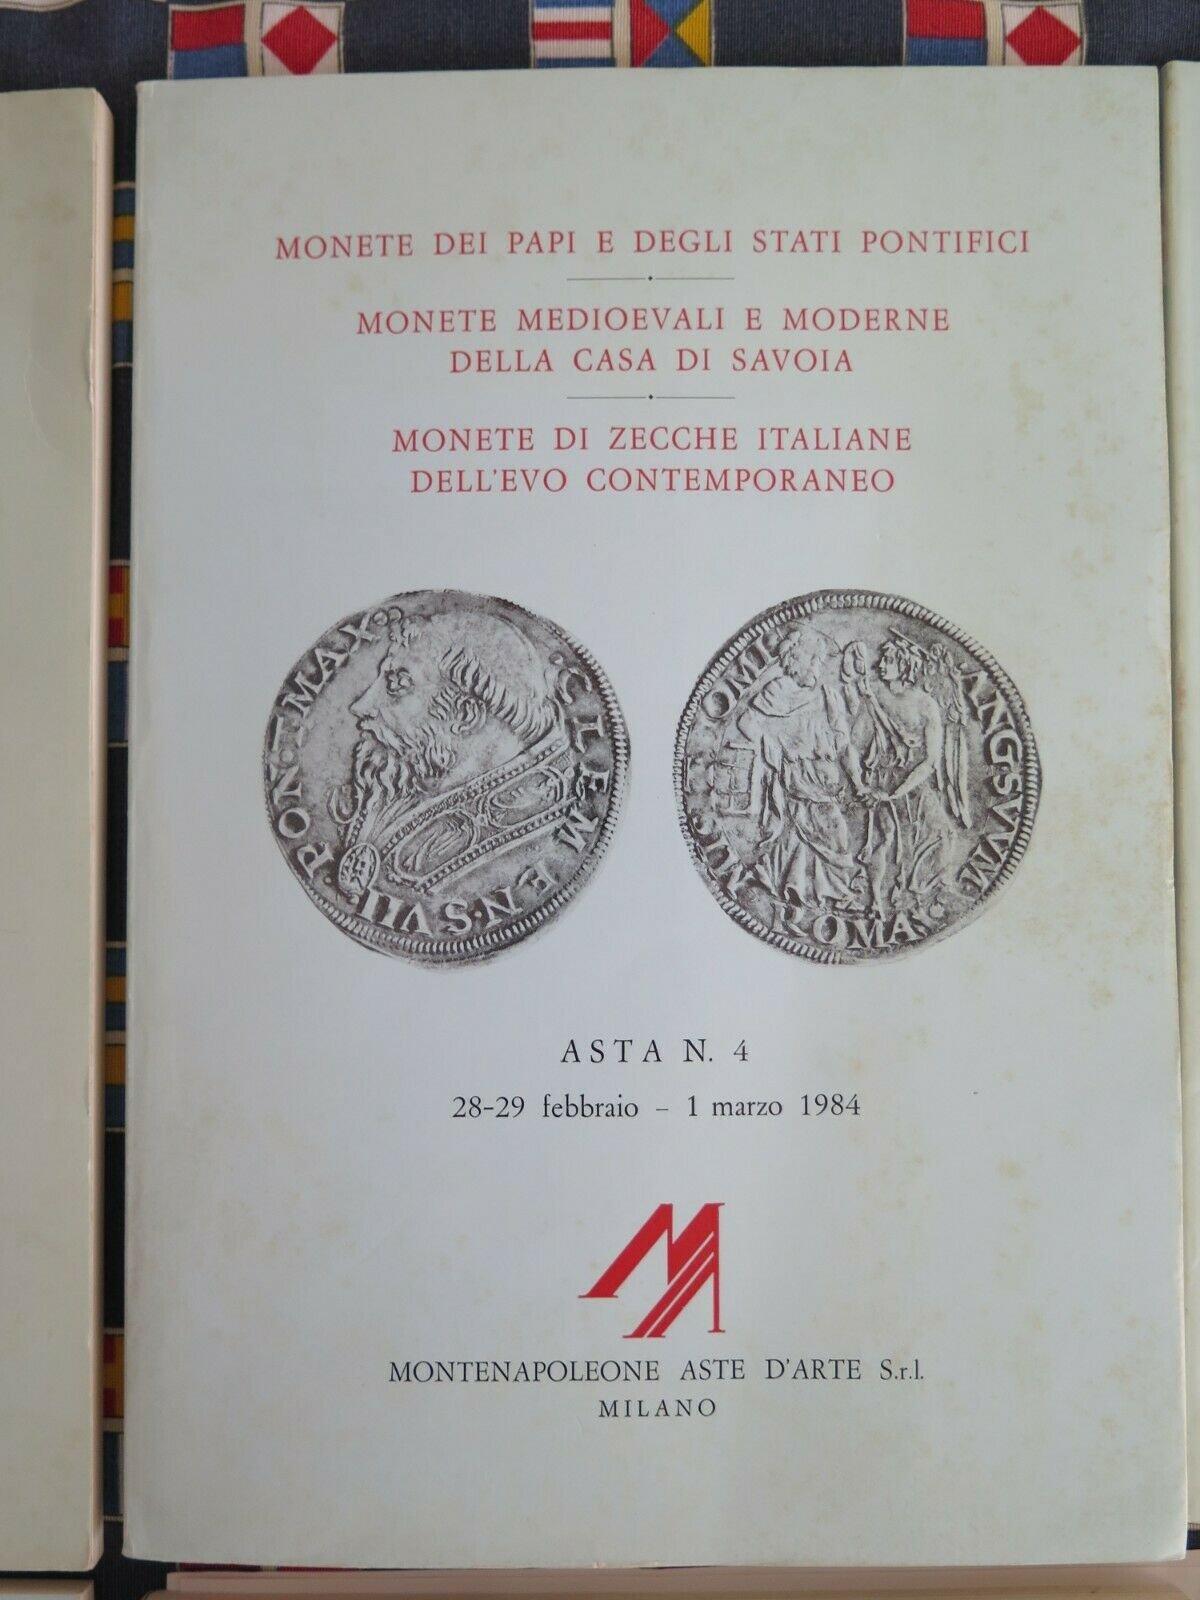 ASTA MONTENAPOLEONE n.4 - MONETE E MEDAGLIE DEI PAPI